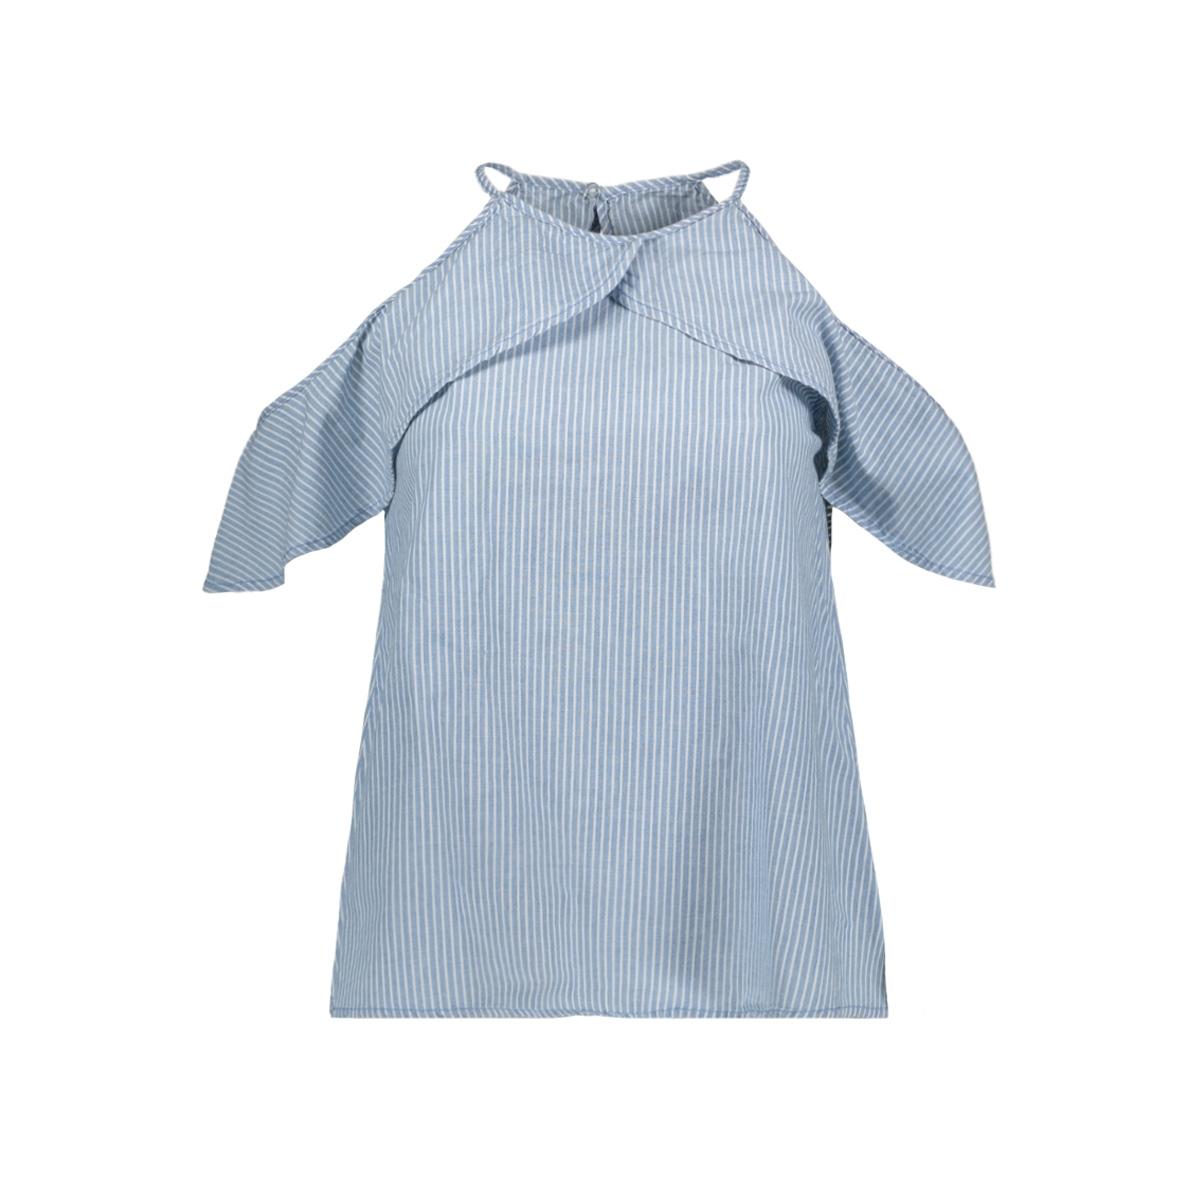 vmsandra chambray top ga 10211807 vero moda top light blue denim